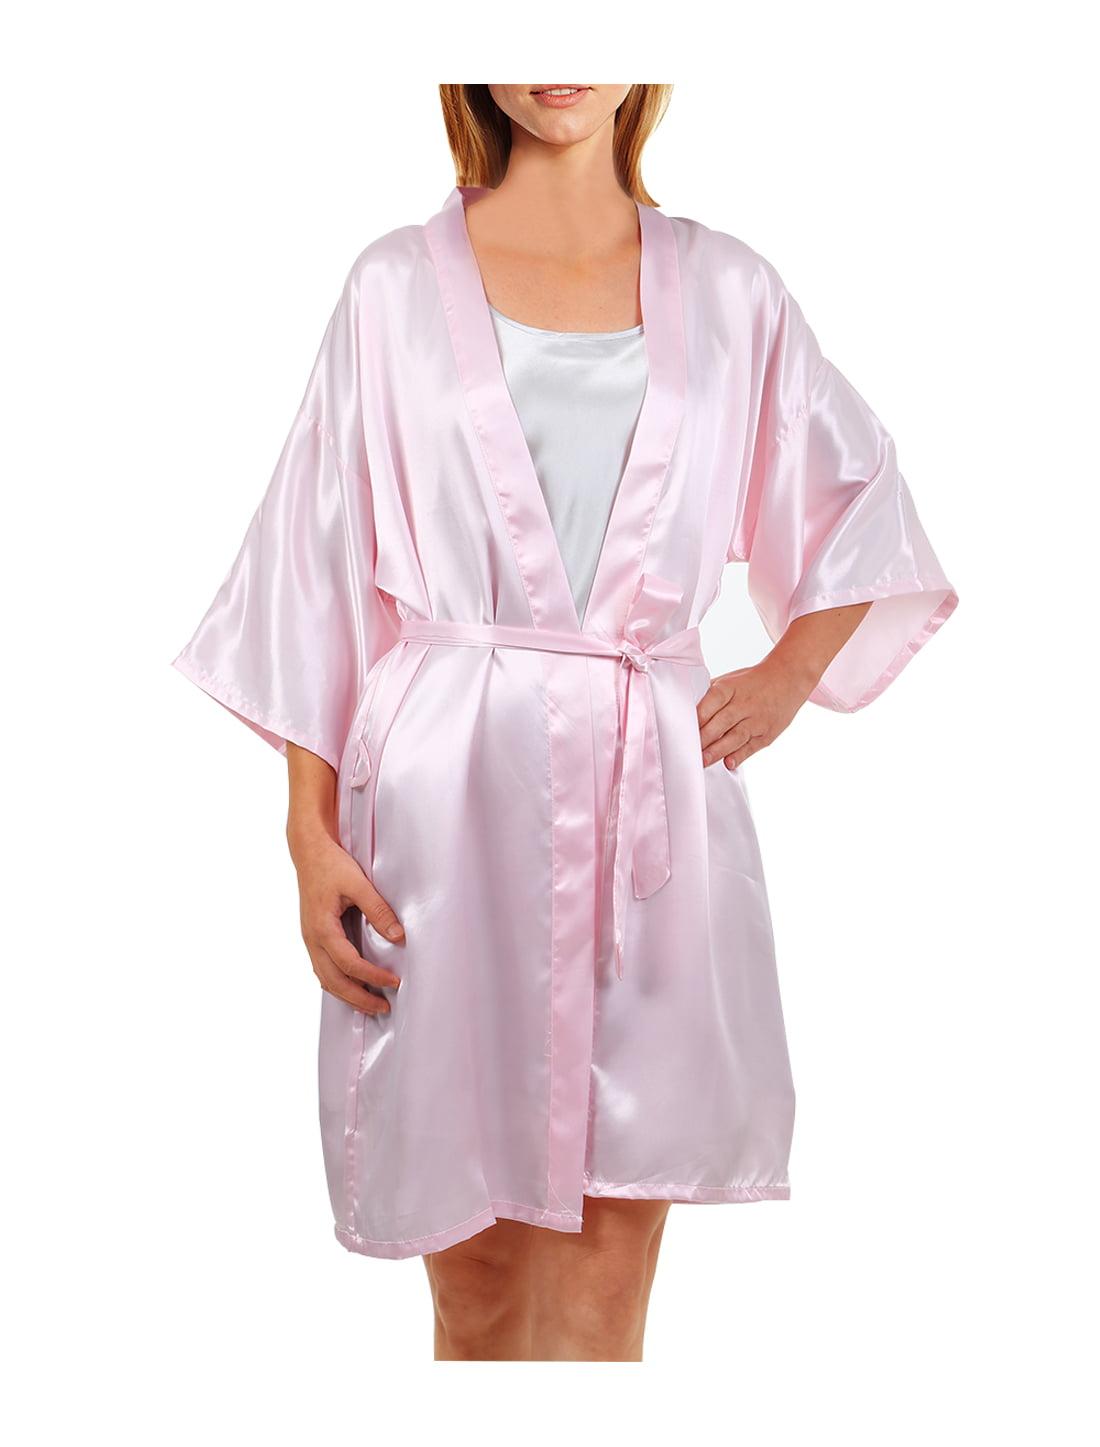 Robe satin sexy